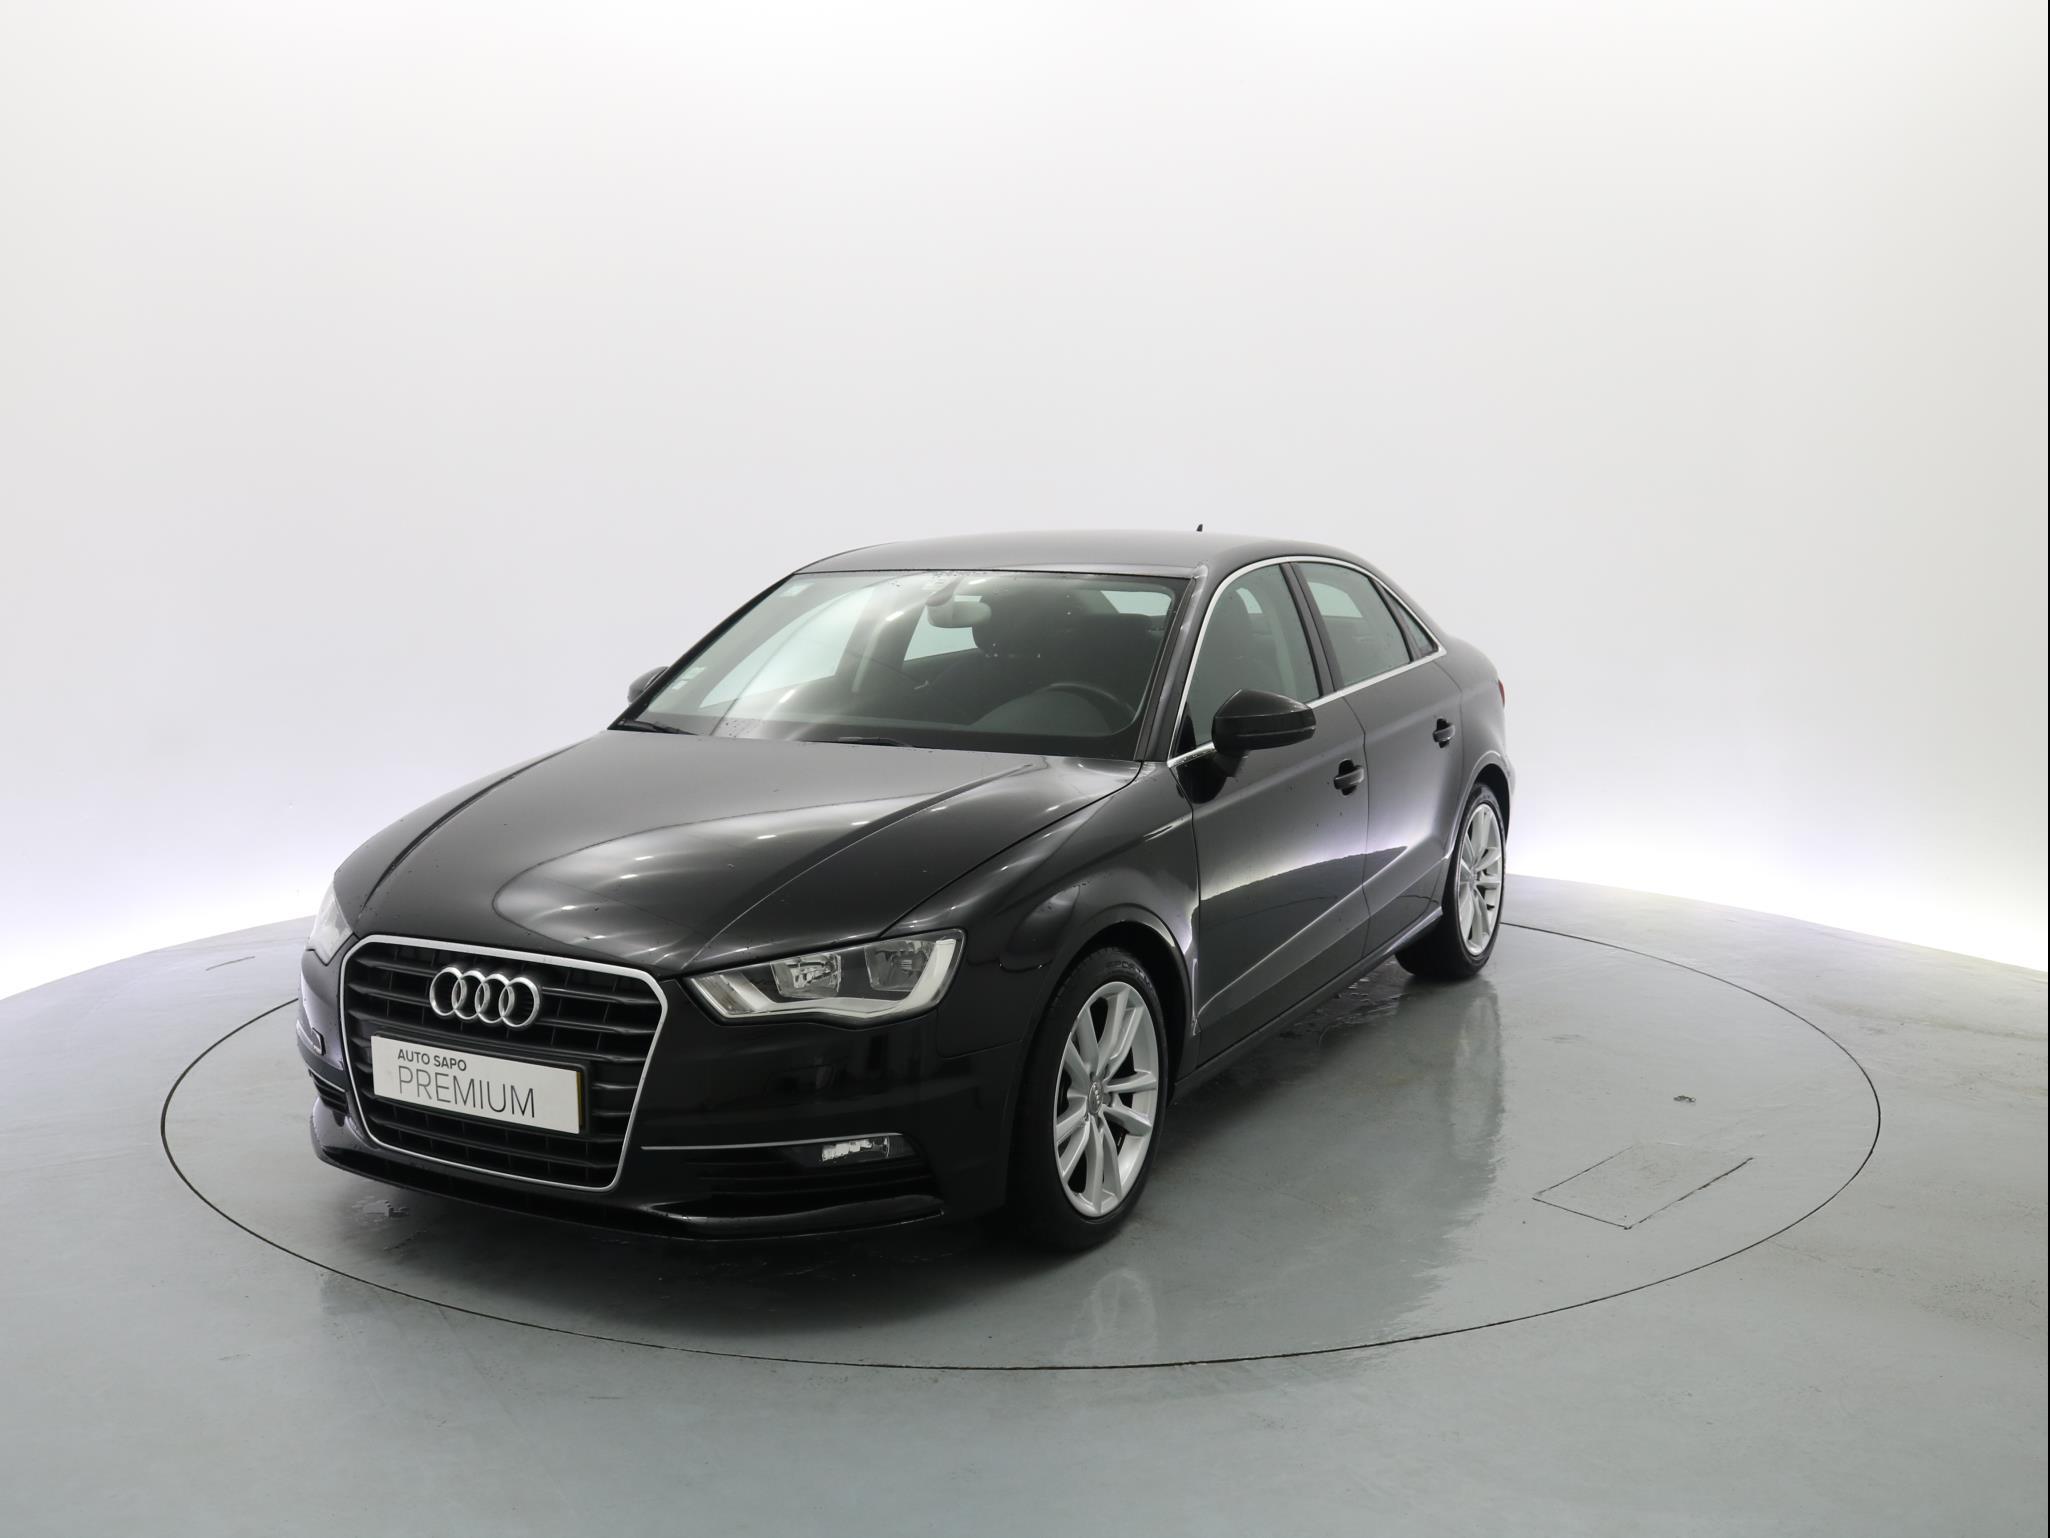 Audi A3 Limousine 1.6 TDI